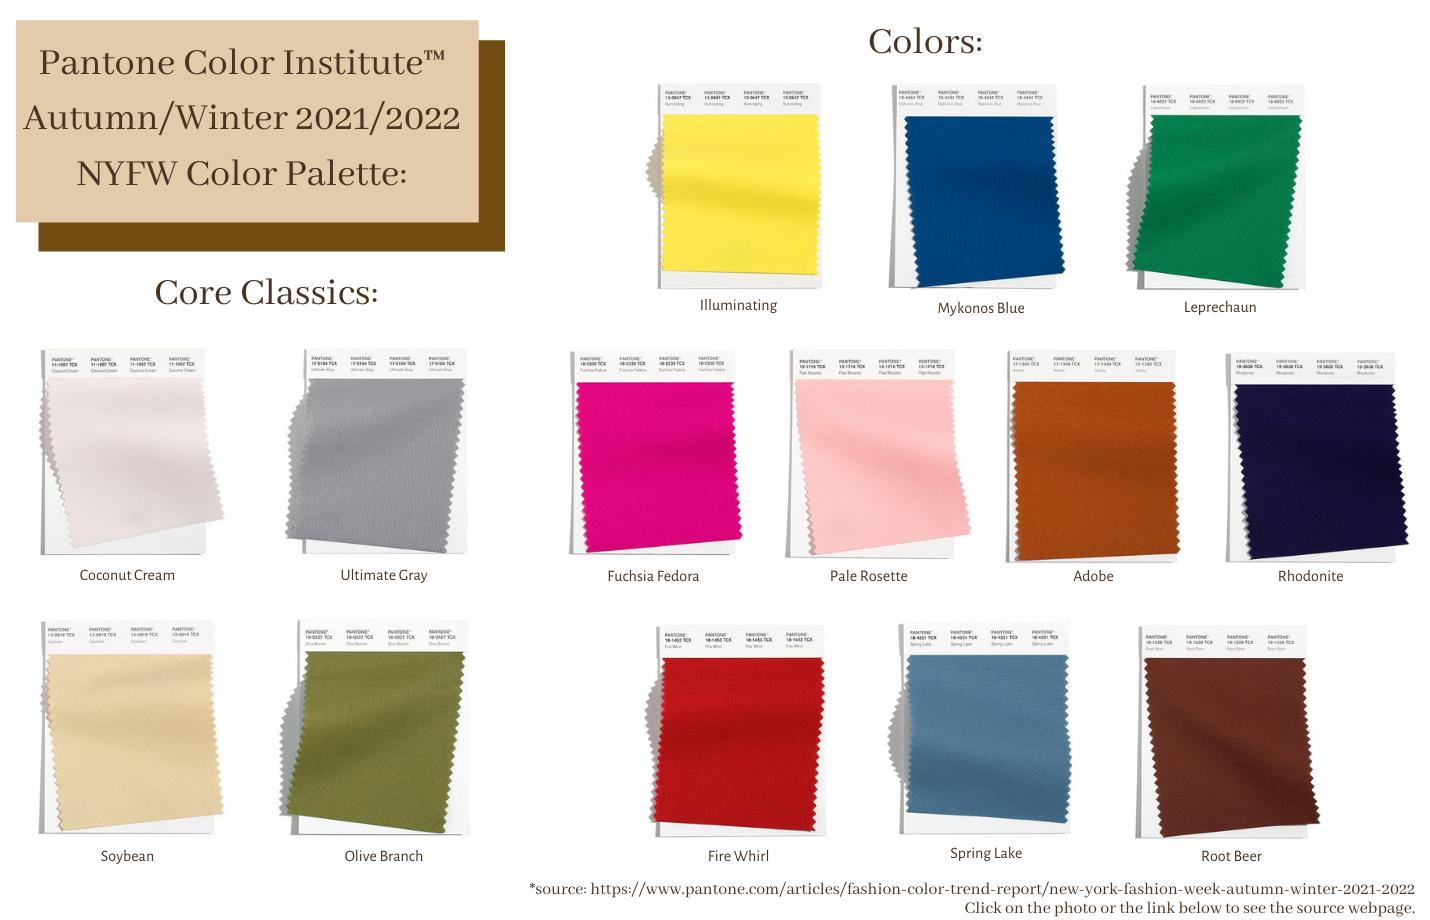 Pantone Color Institute Trending Colors for Fall 2021